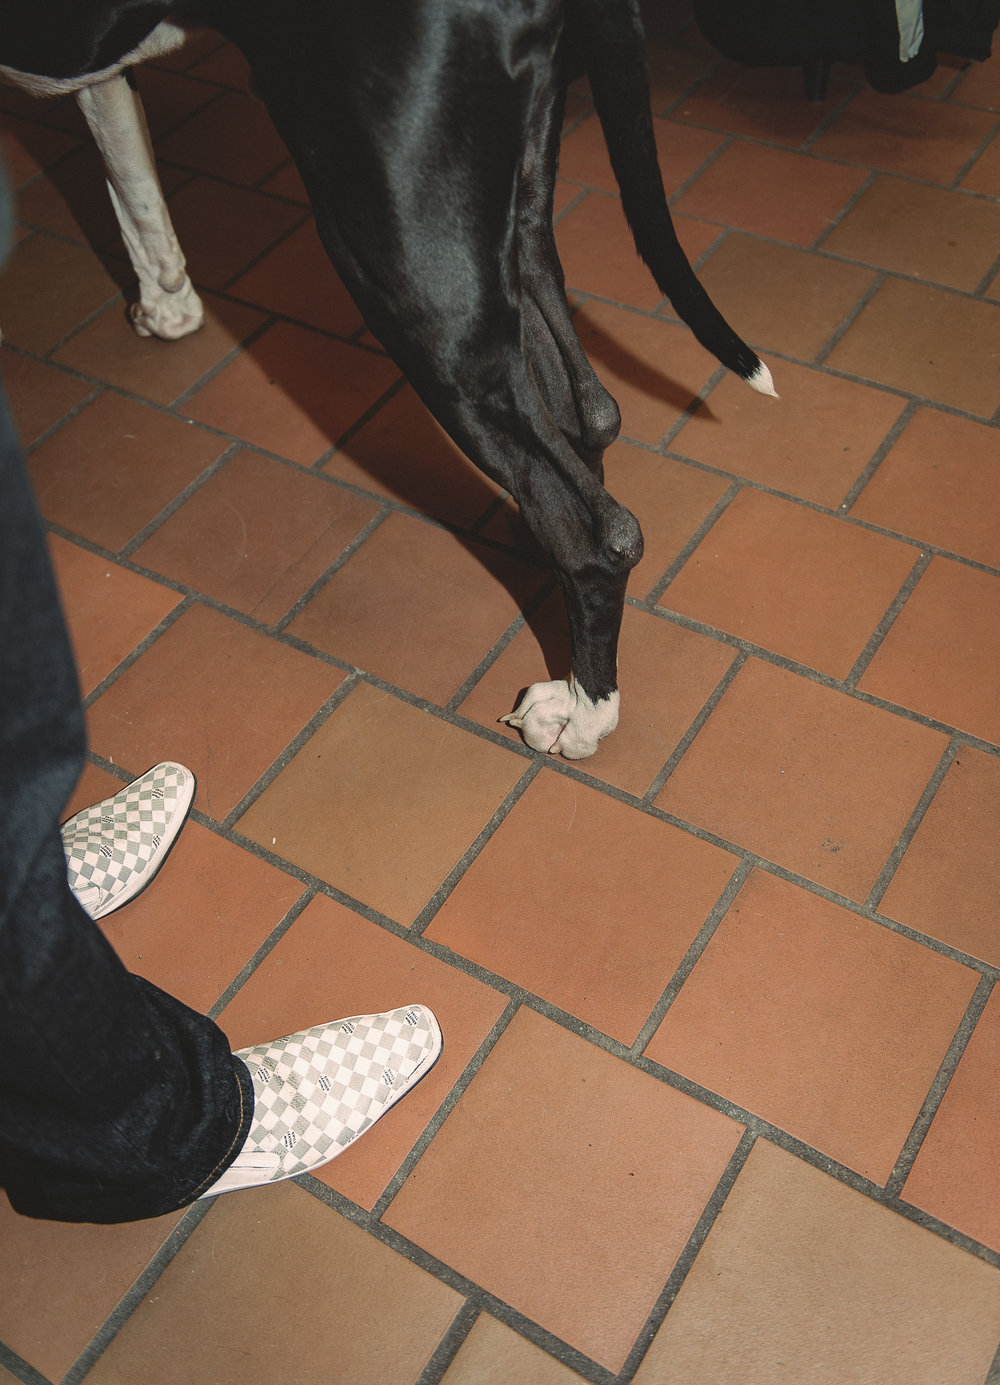 klaus dyba dog show-7.jpg